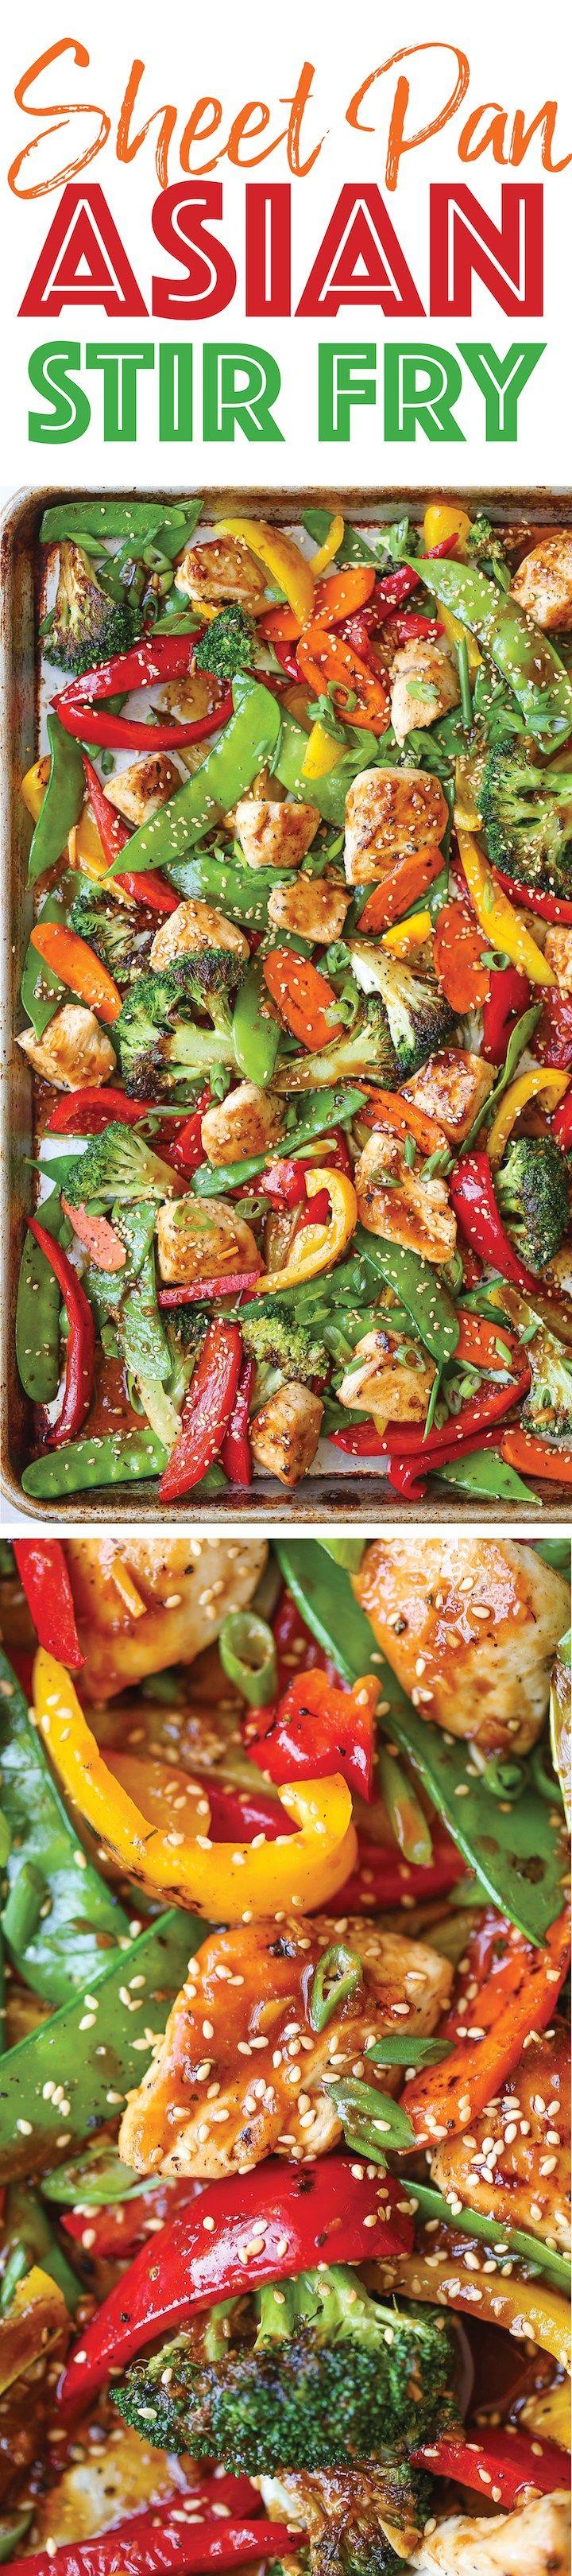 Sheet Pan Asian Stir Fry